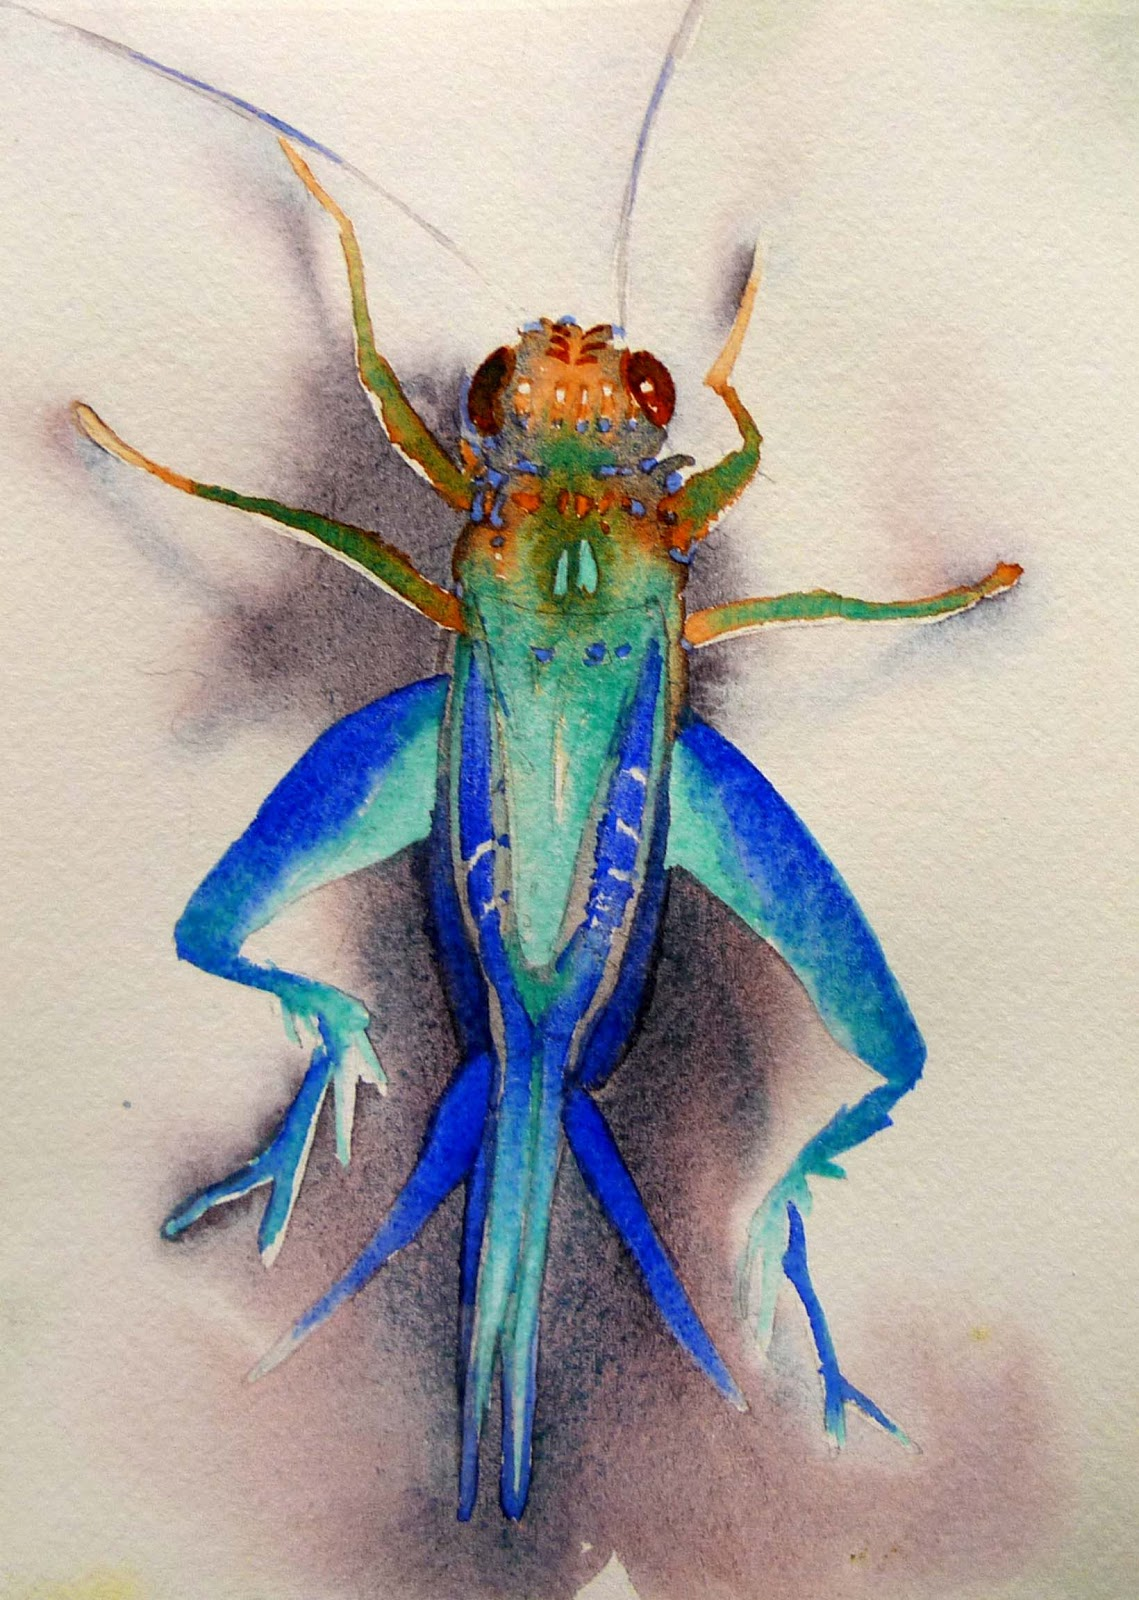 cricket life cycle diagram bmw radio wiring house species elsavadorla